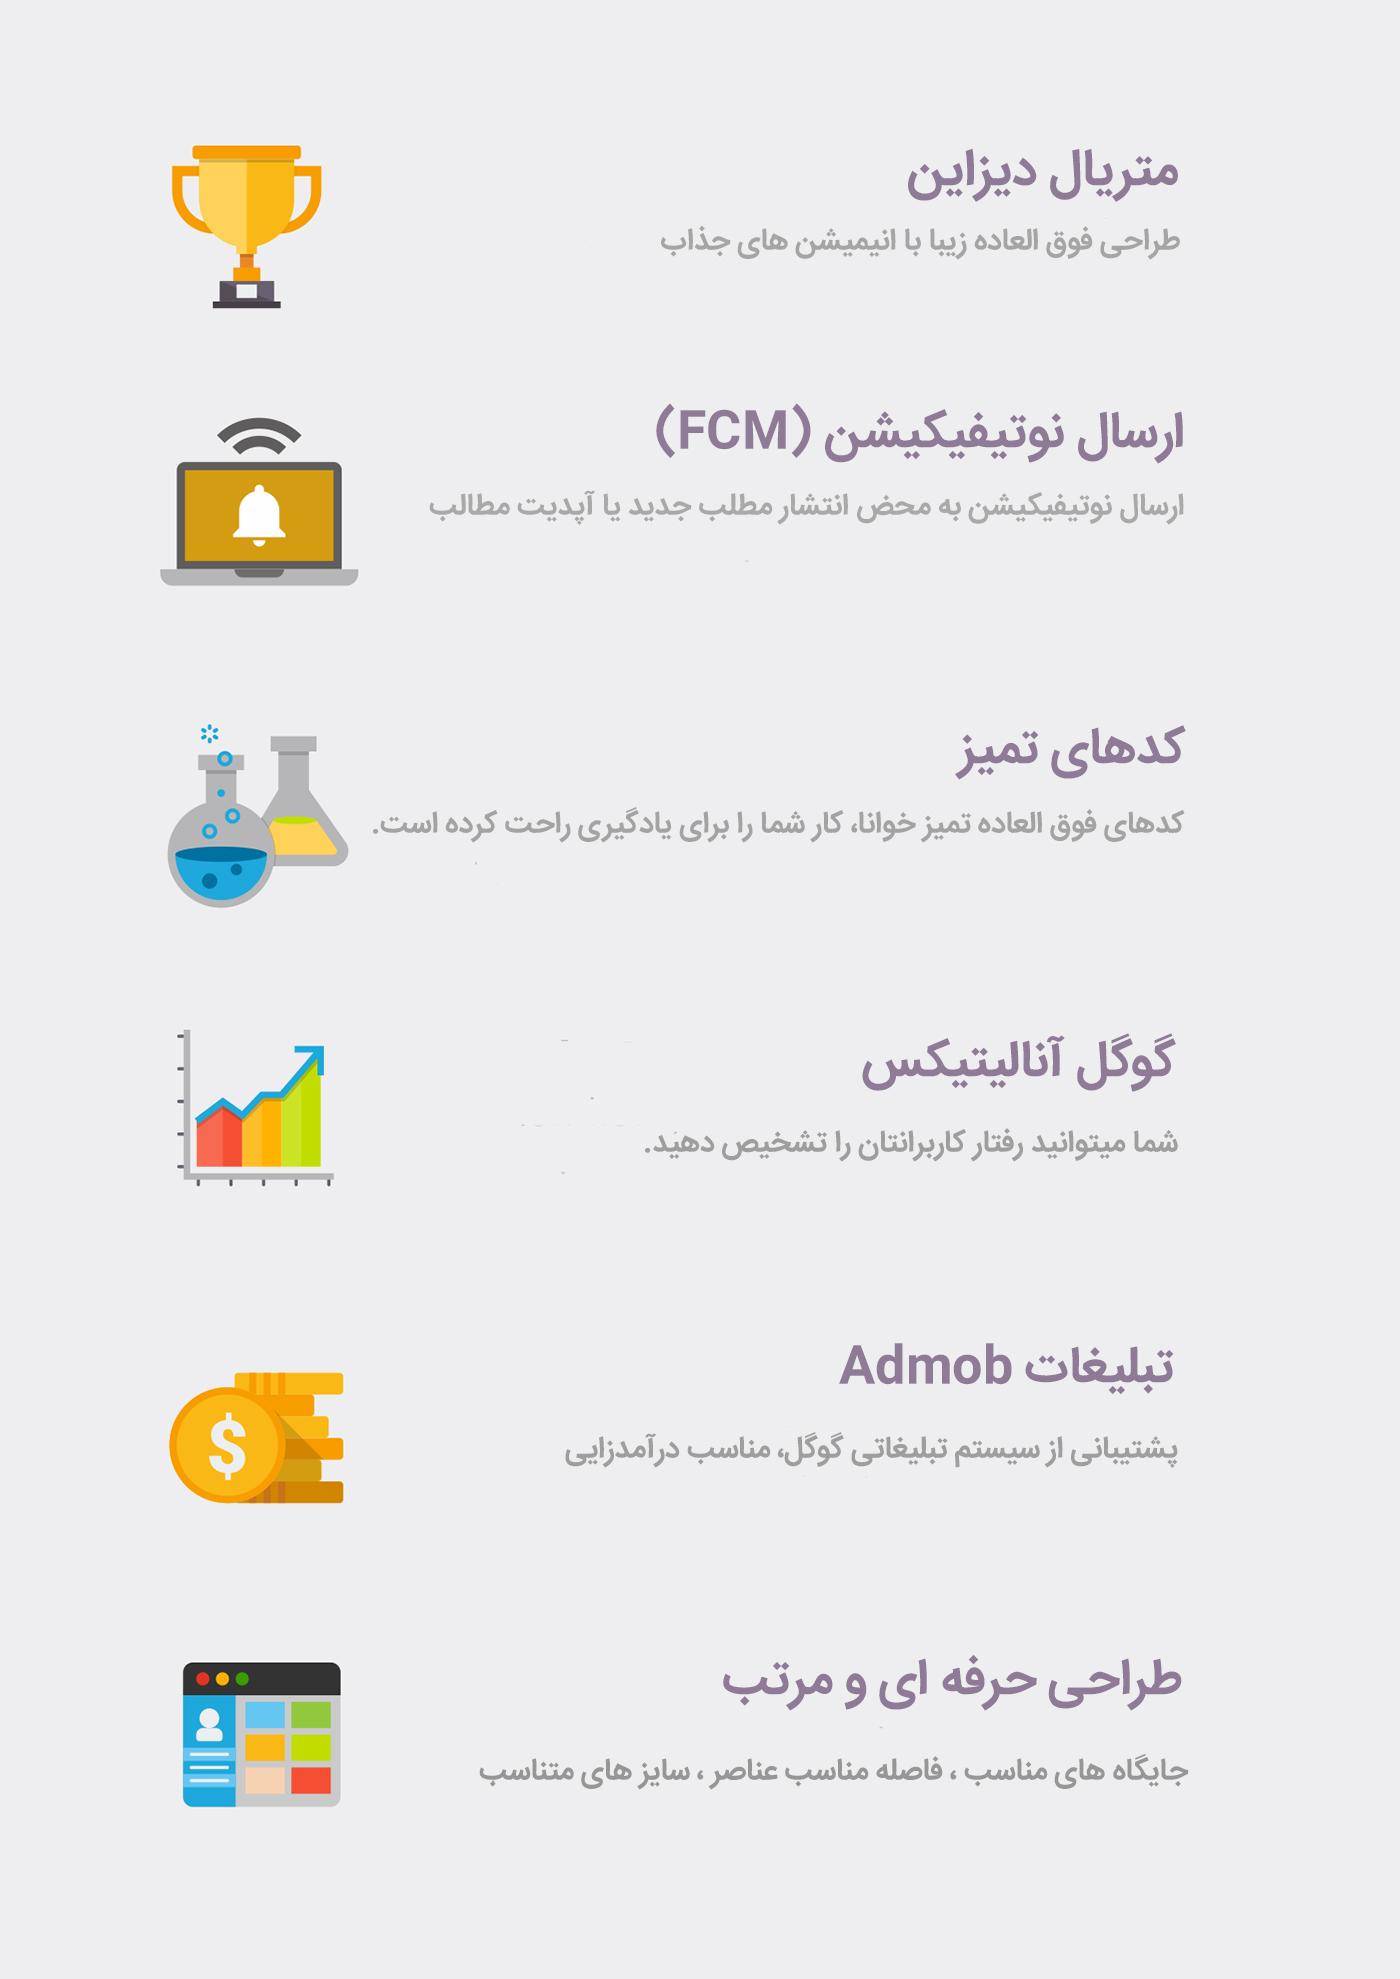 سورس اپلیکیشن وردپرس